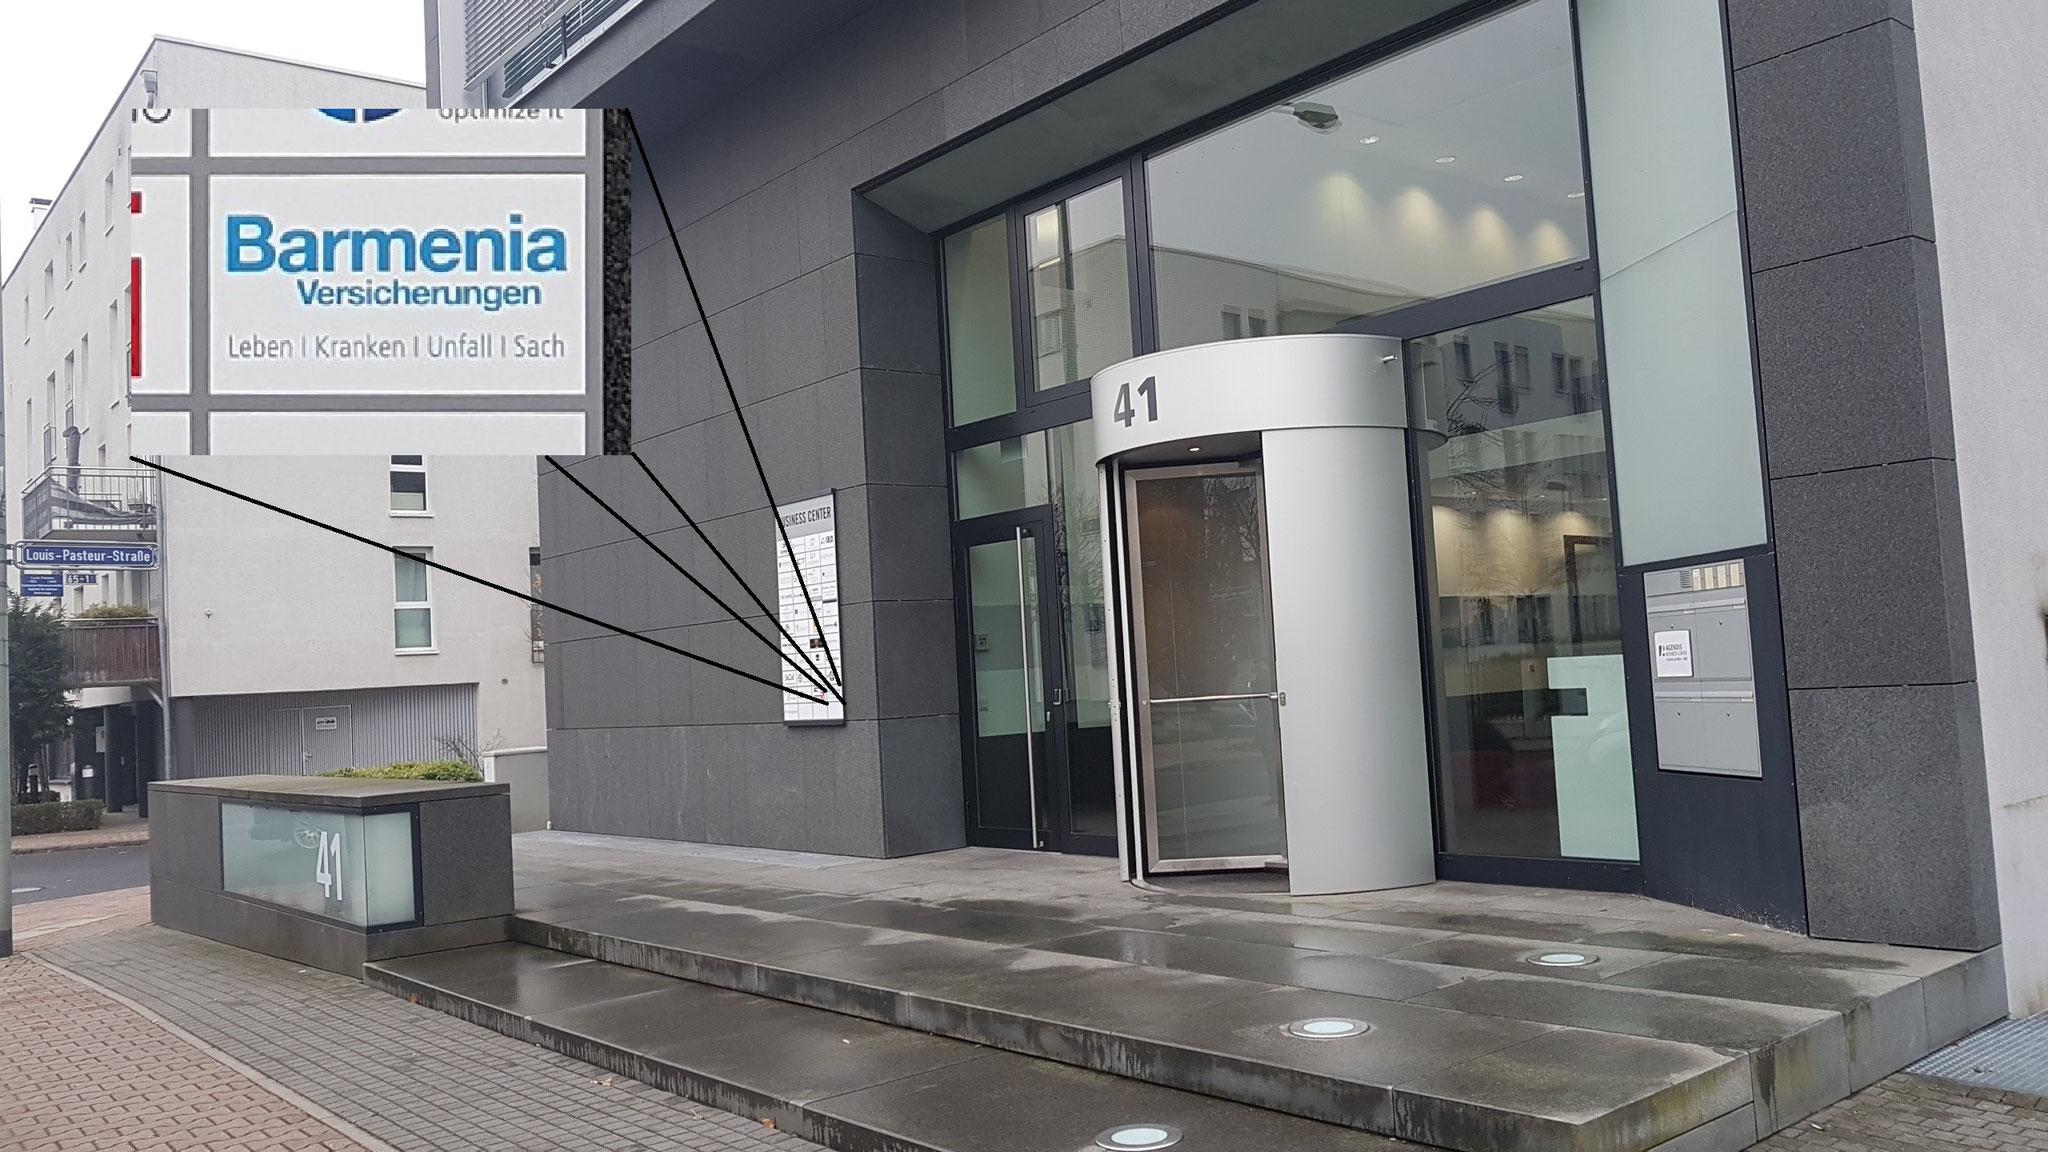 Eingang Bürocenter Agendis (Barmenia Versicherungen)